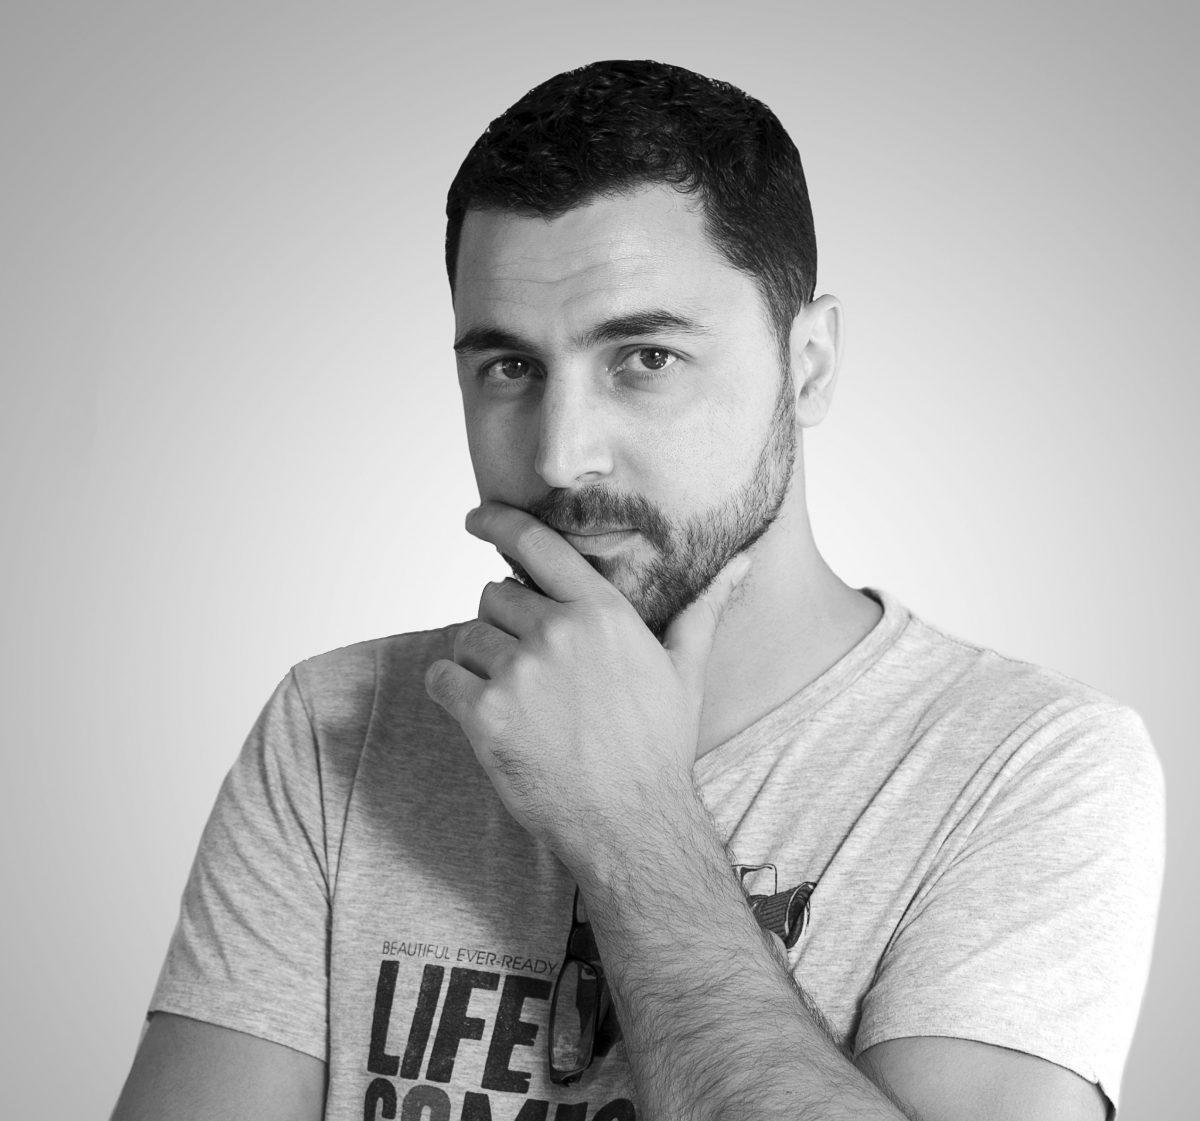 Director Roman Shumunov